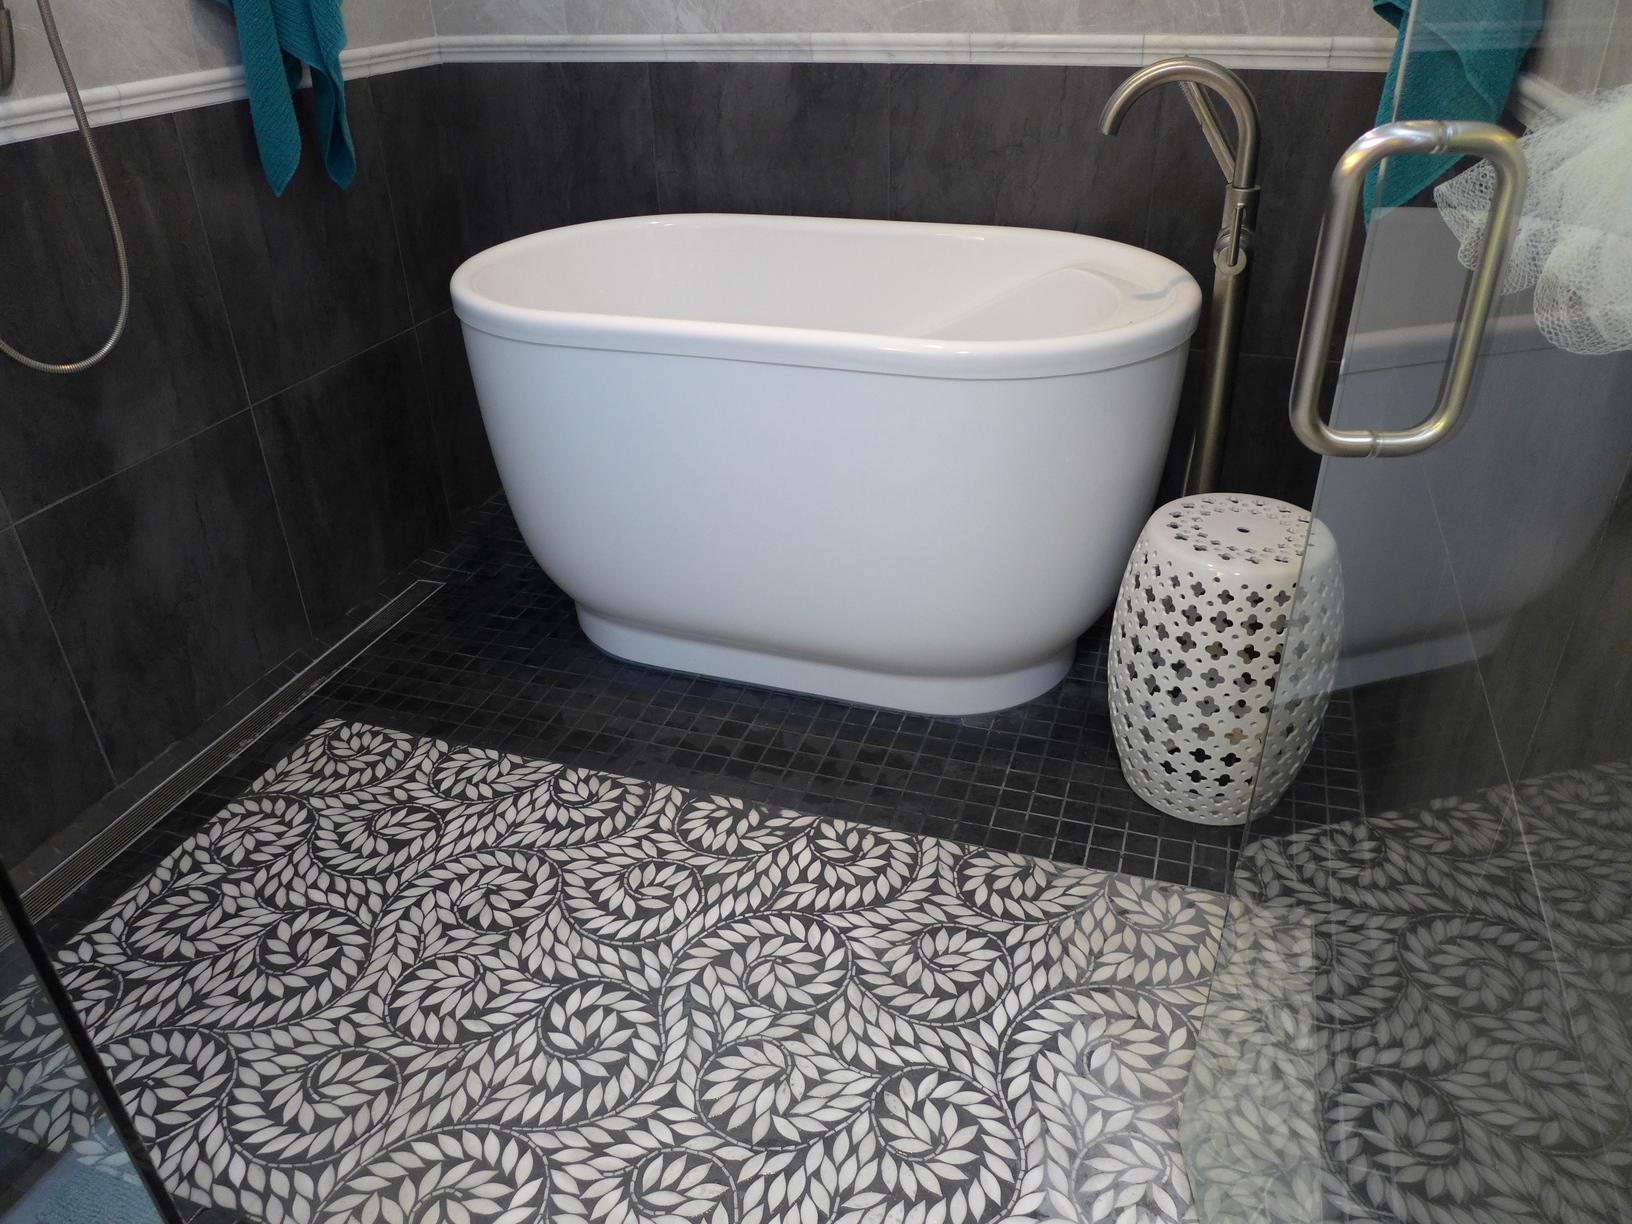 Bathroom Remodel in Scottsdale, AZ - After Photo